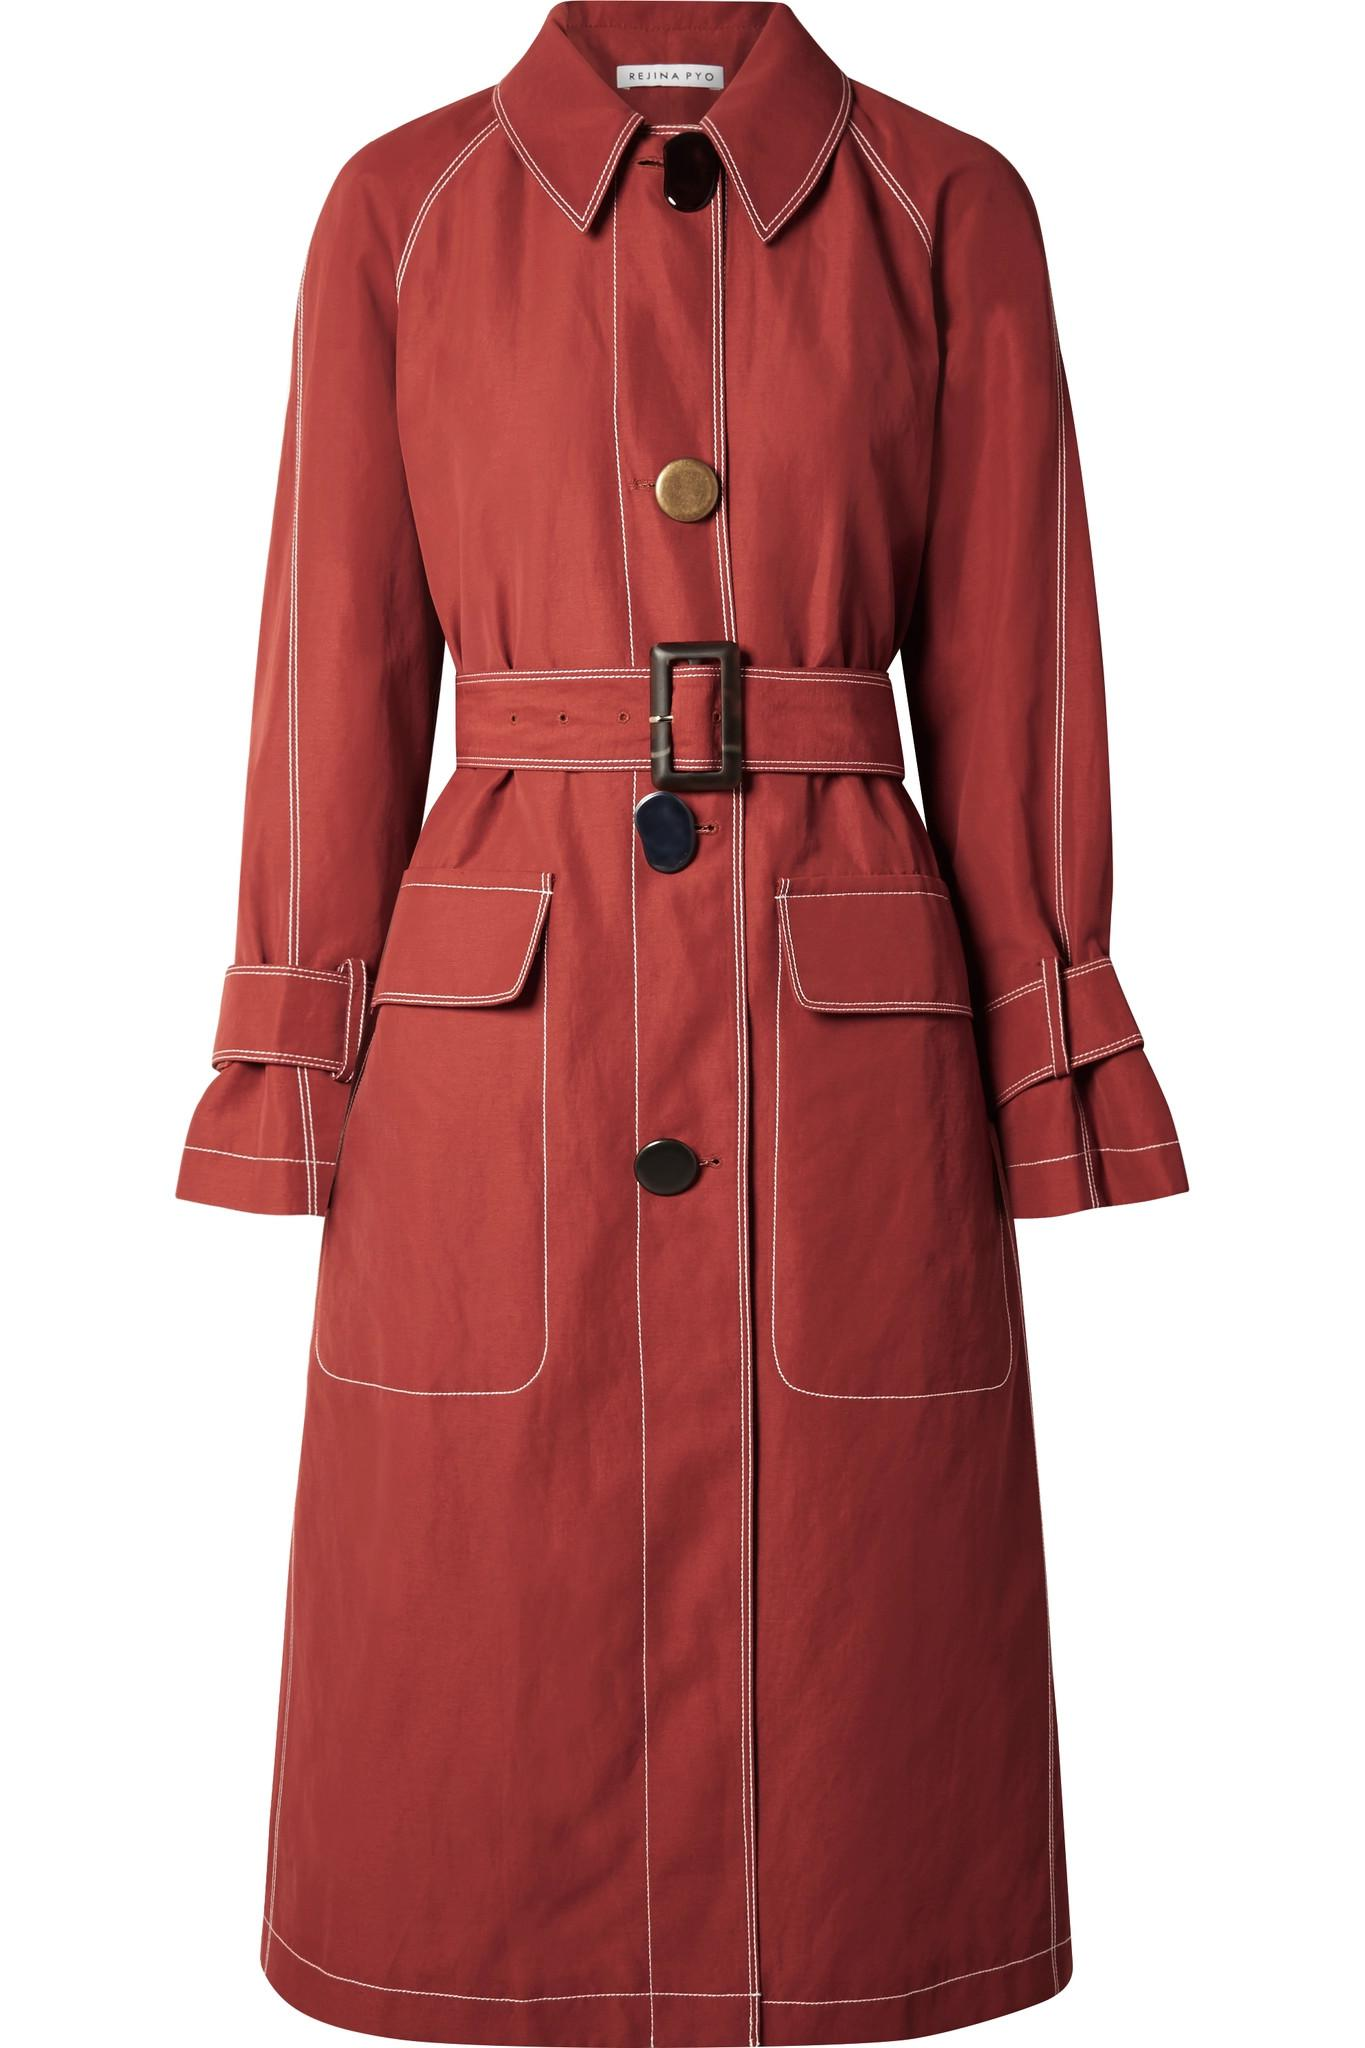 Pyo Coloris Lyst Coat En Toile Rouge Hazel Rejina Trench 6fyYb7vg